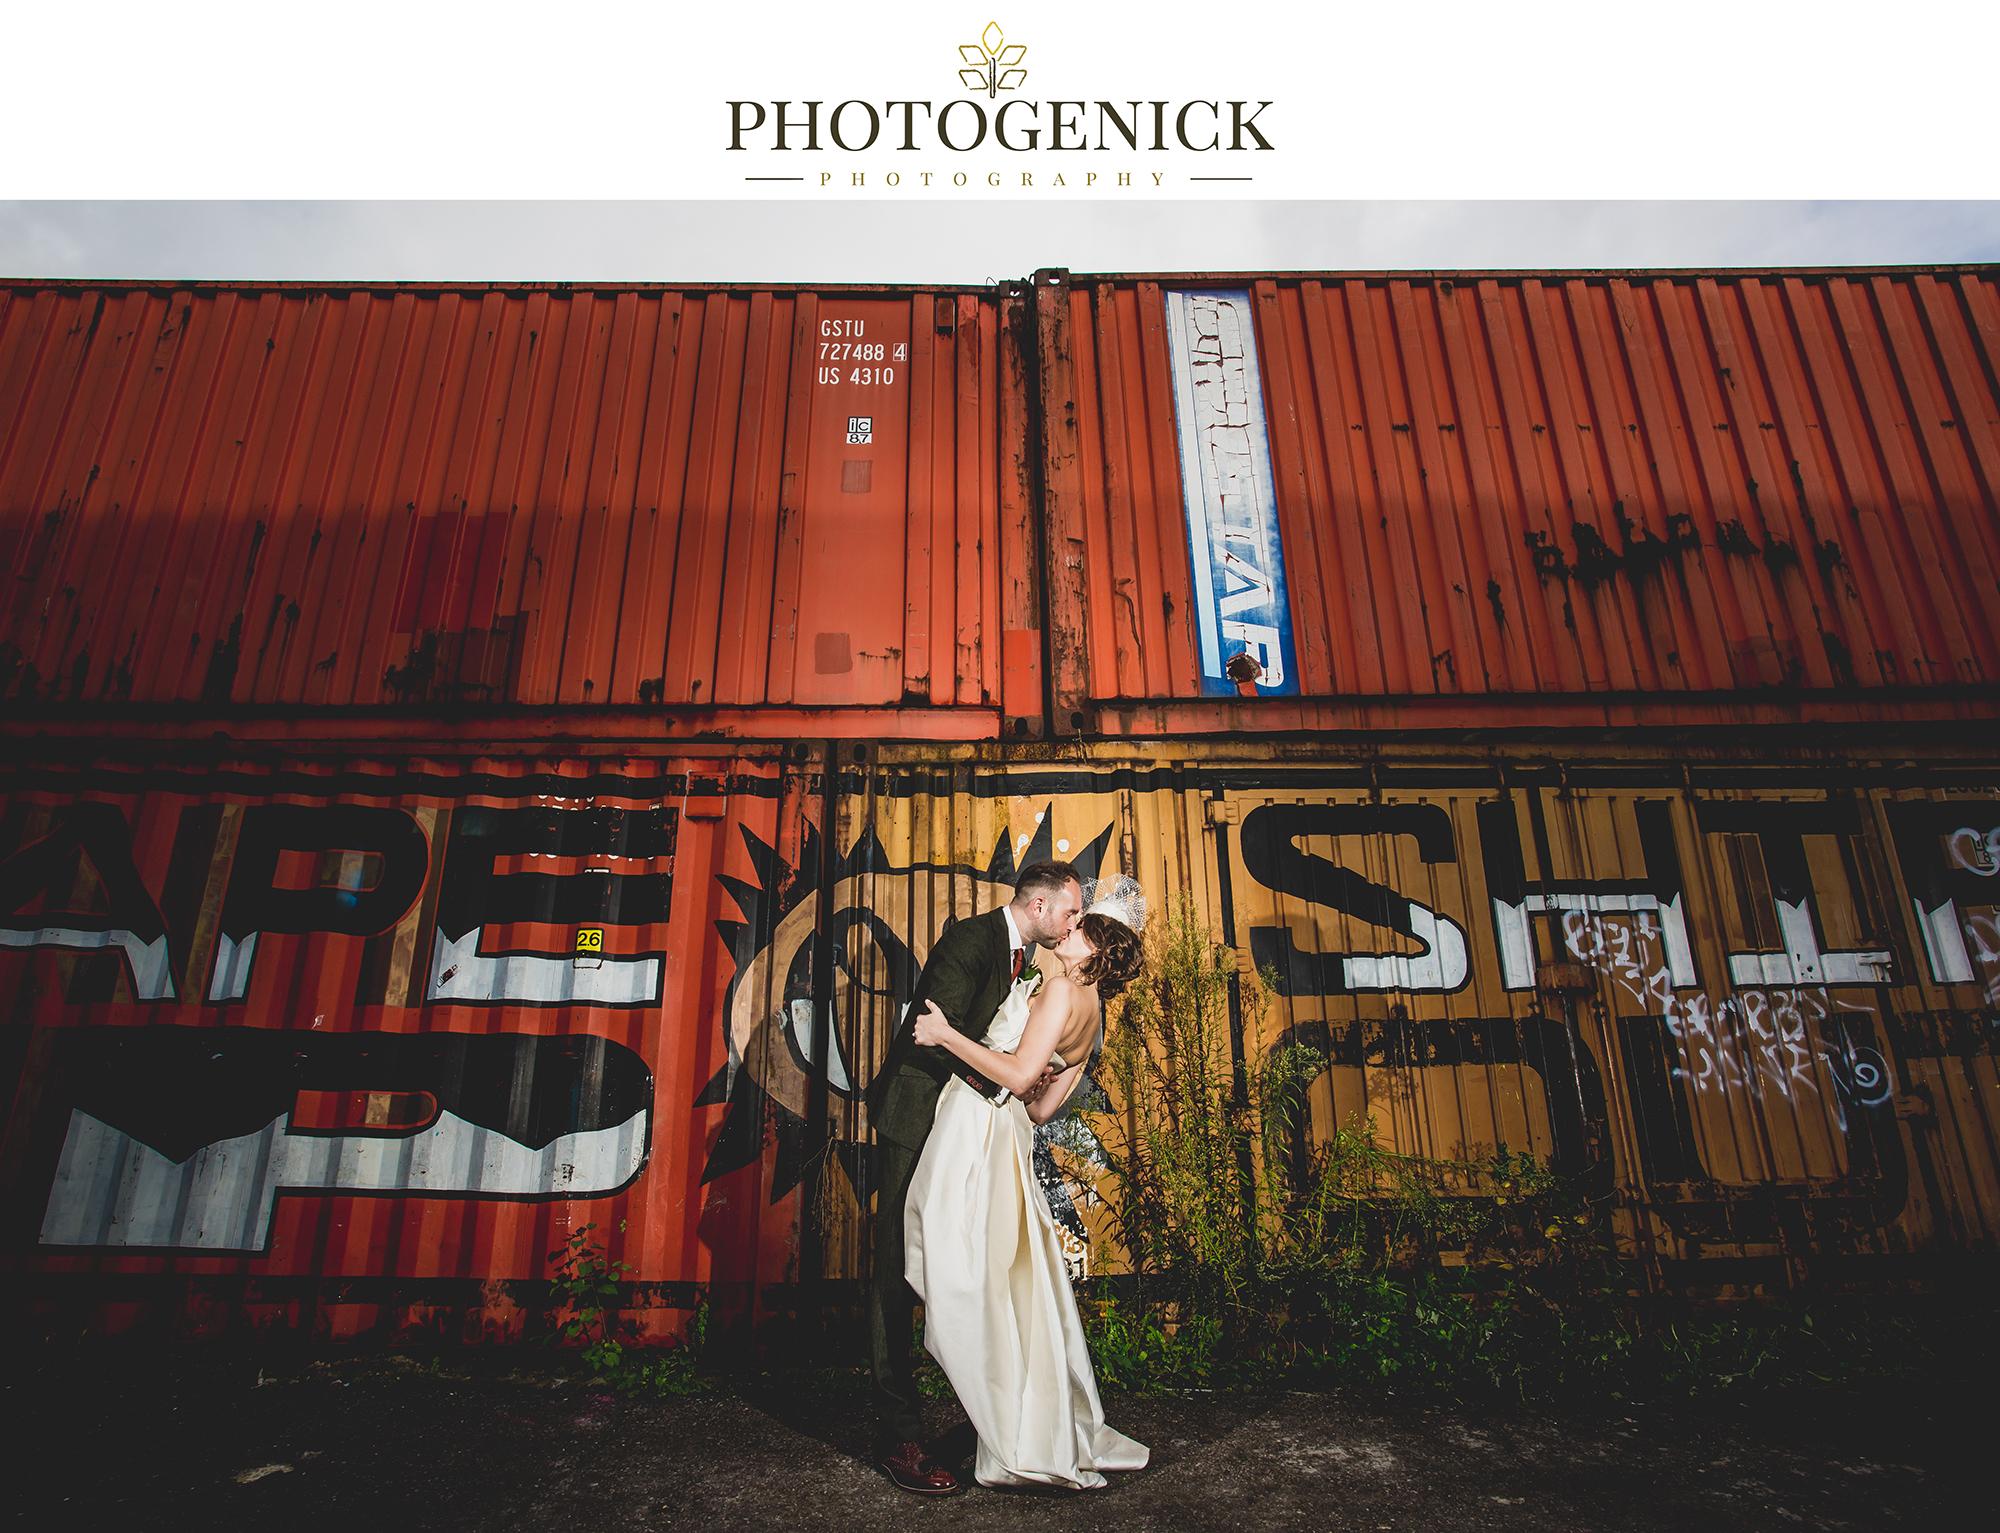 wedding photographers in rotherham, Yorkshire